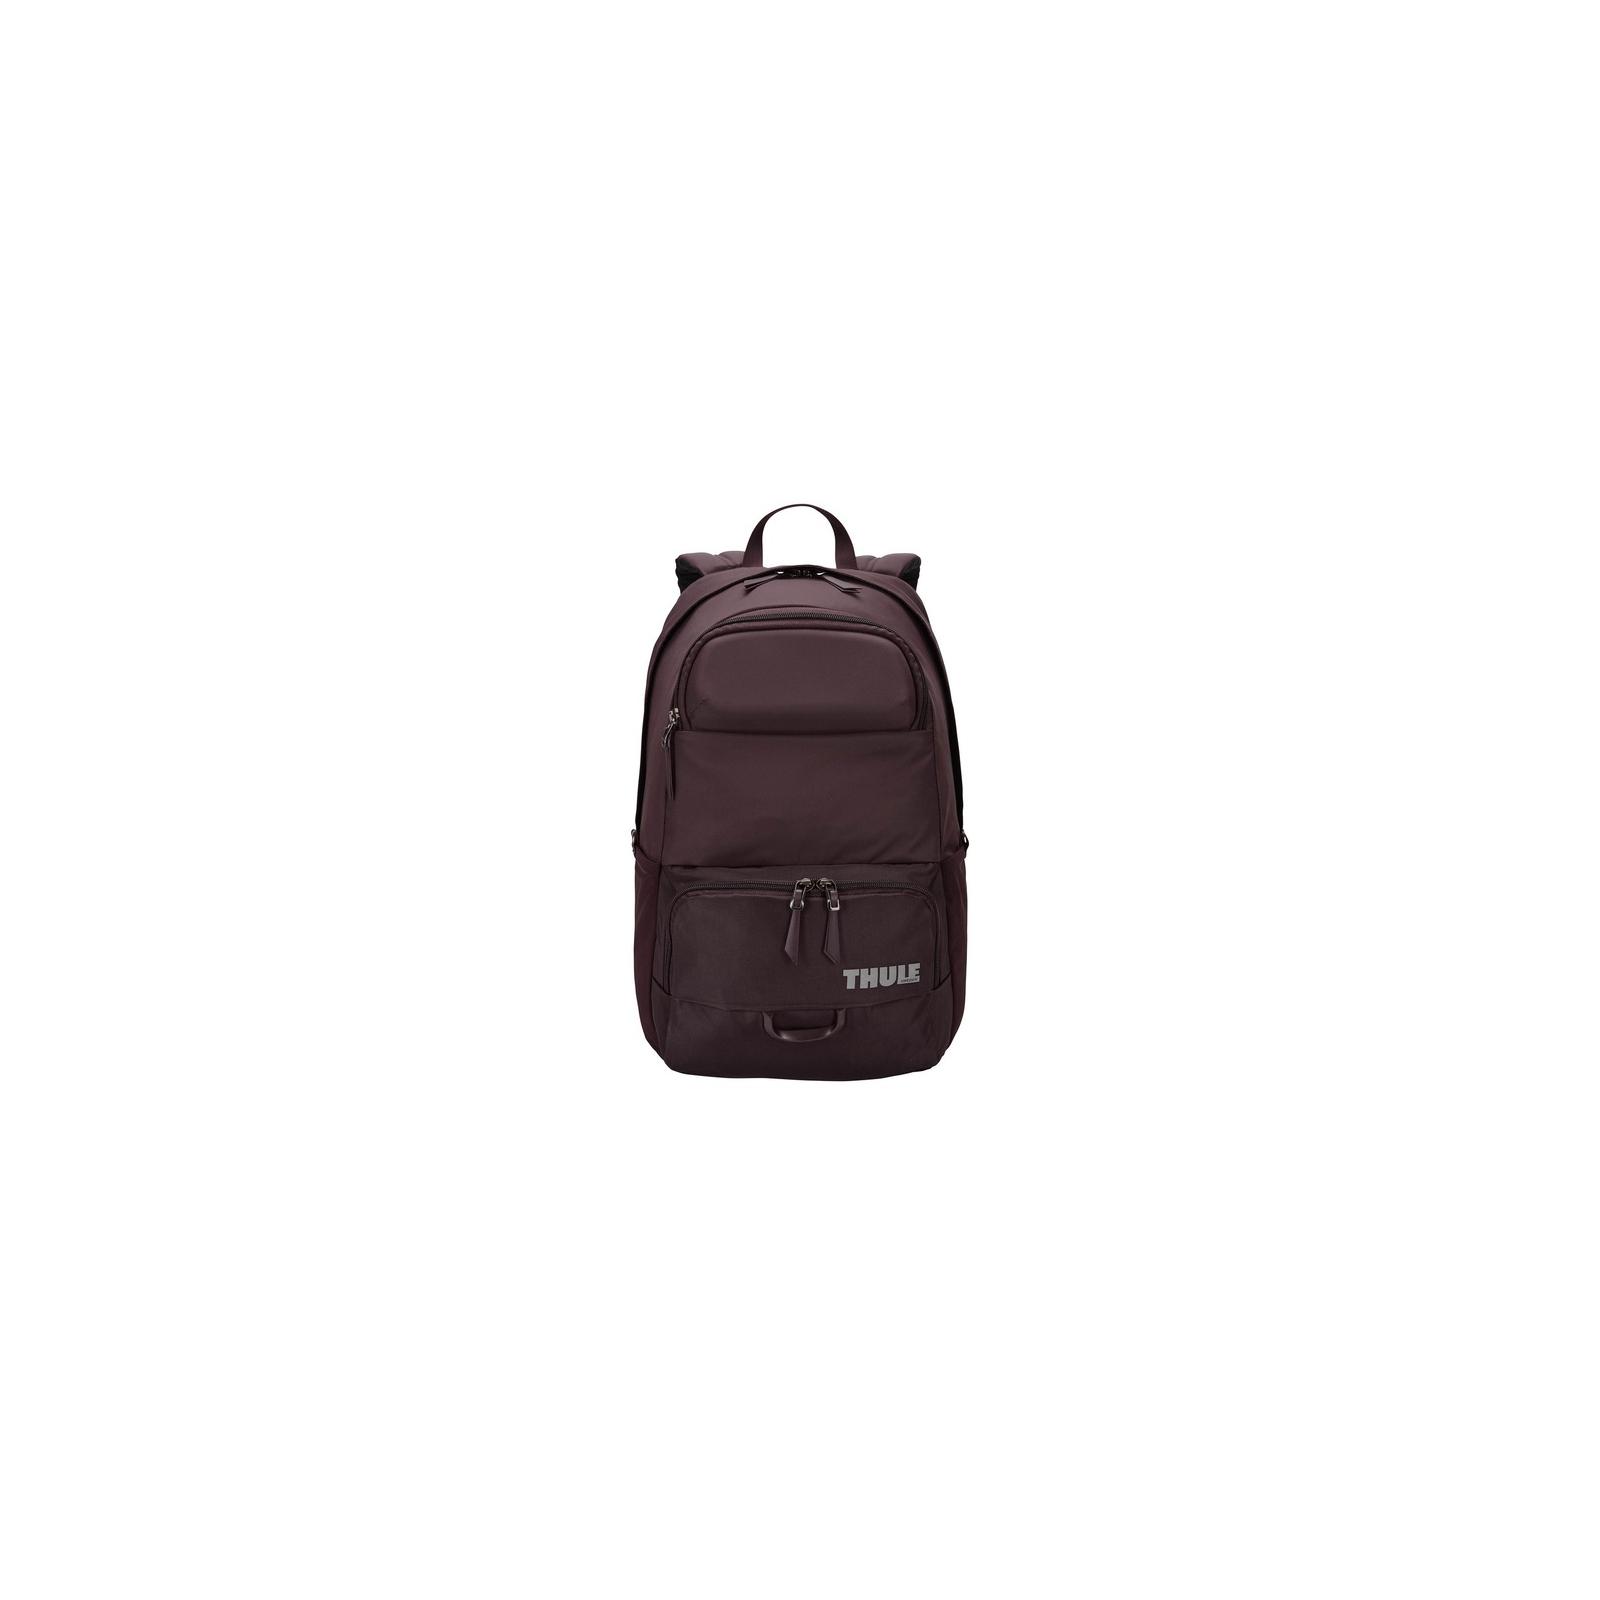 "Рюкзак для ноутбука Thule 15"" Departer 21L Corsair/Bluegrass TDMB-115 (3202905) изображение 3"